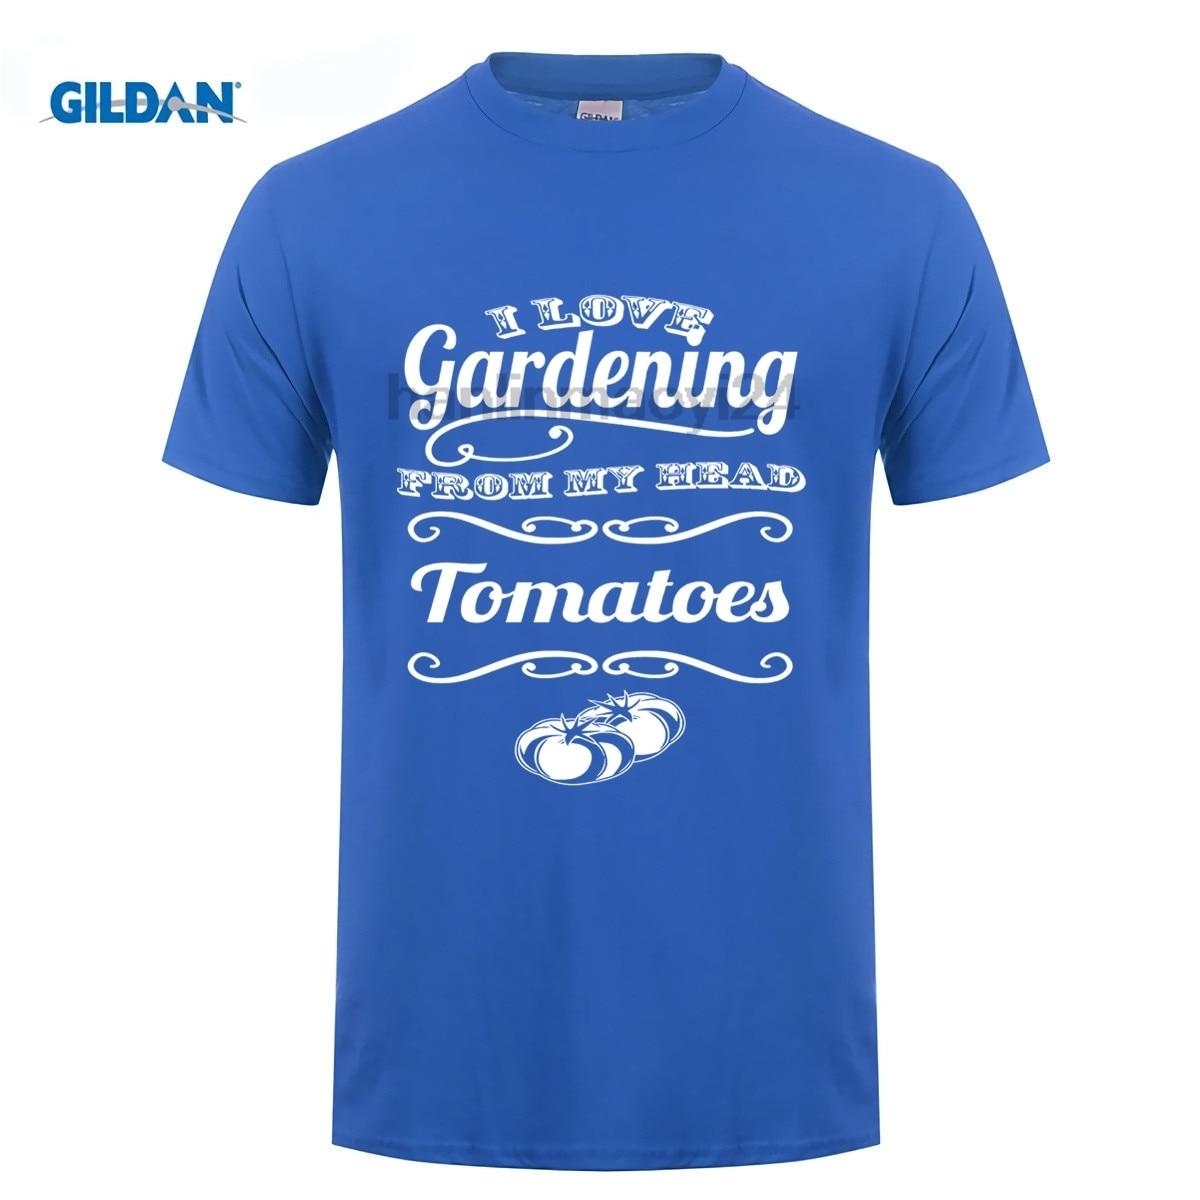 GILDAN I love Gardening From My Head ToMaToes Tshirt